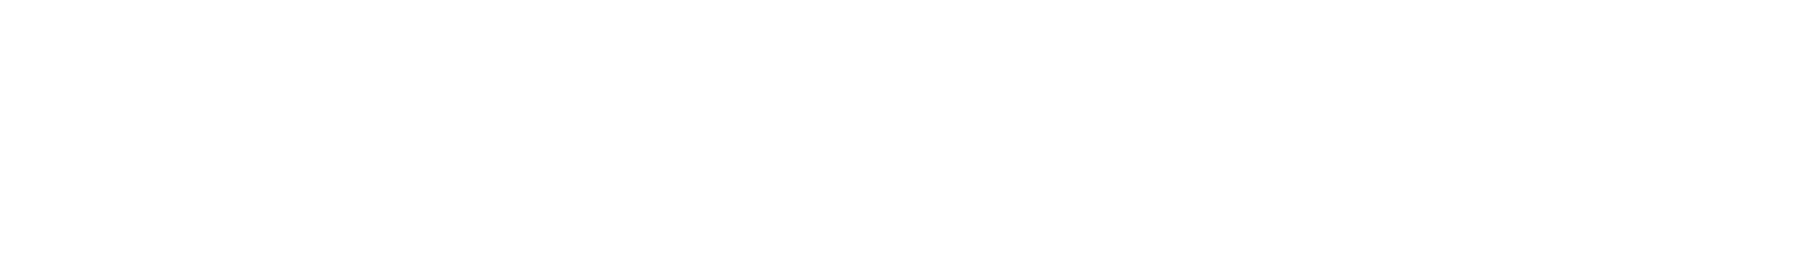 arab percussion loop 23